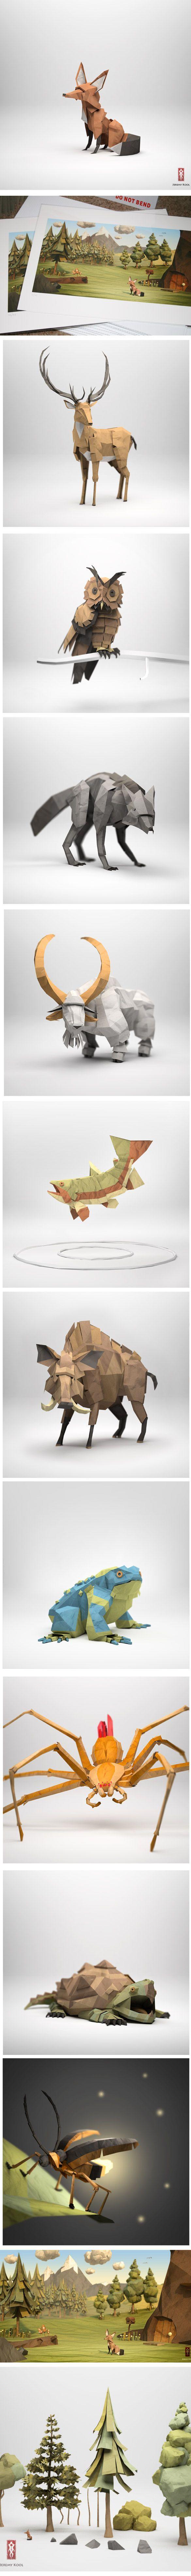 ₪ Paper Art Potpourri ₪  Jeremy Kool | paper sculptures